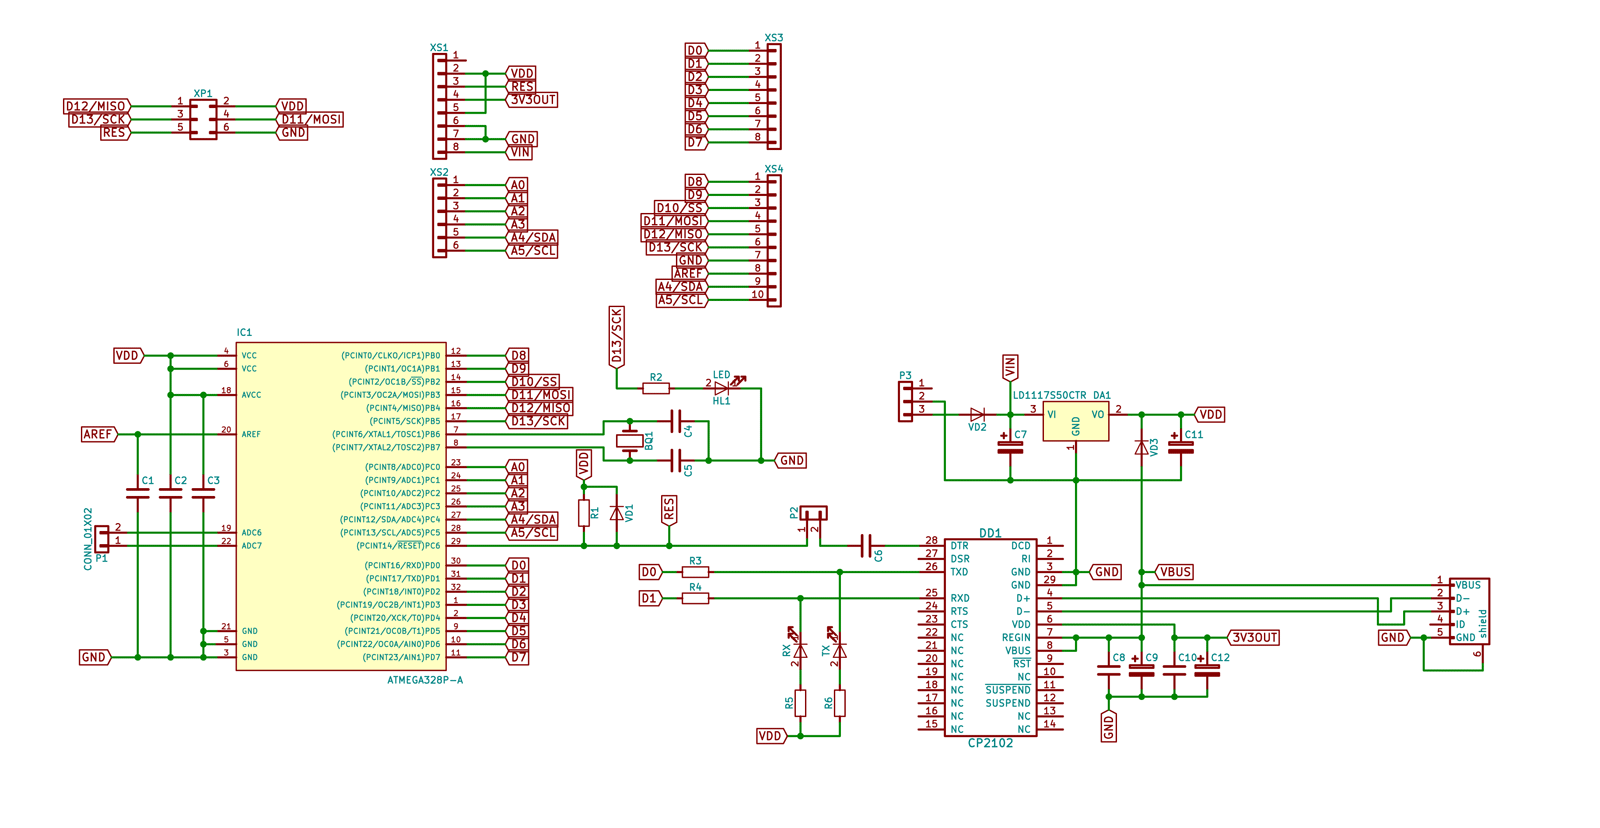 Ванилин, Arduino Uno, ATmega328P-AU, CP2102